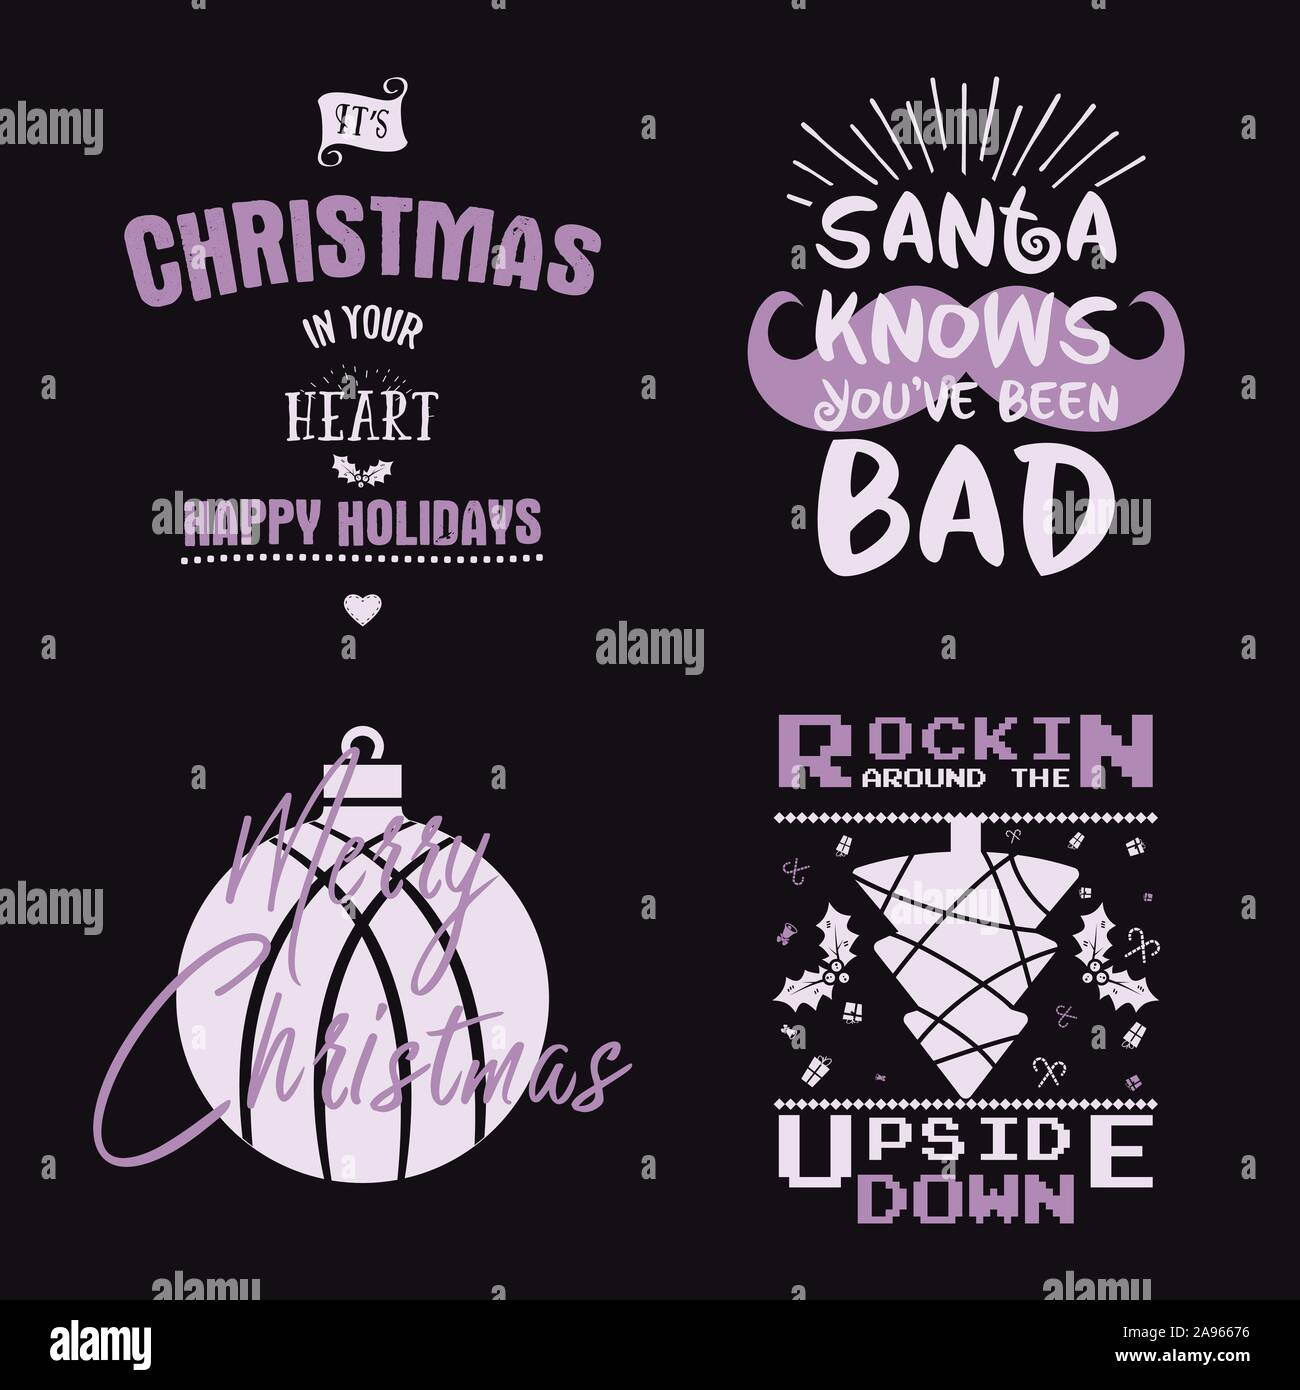 Funny Merry Christmas Happy New Year Season Graphic Prints Set T Shirt Designs For Xmas Party Decor Holiday Decor With Xmas Tree Santa Mug Texts Stock Vector Image Art Alamy